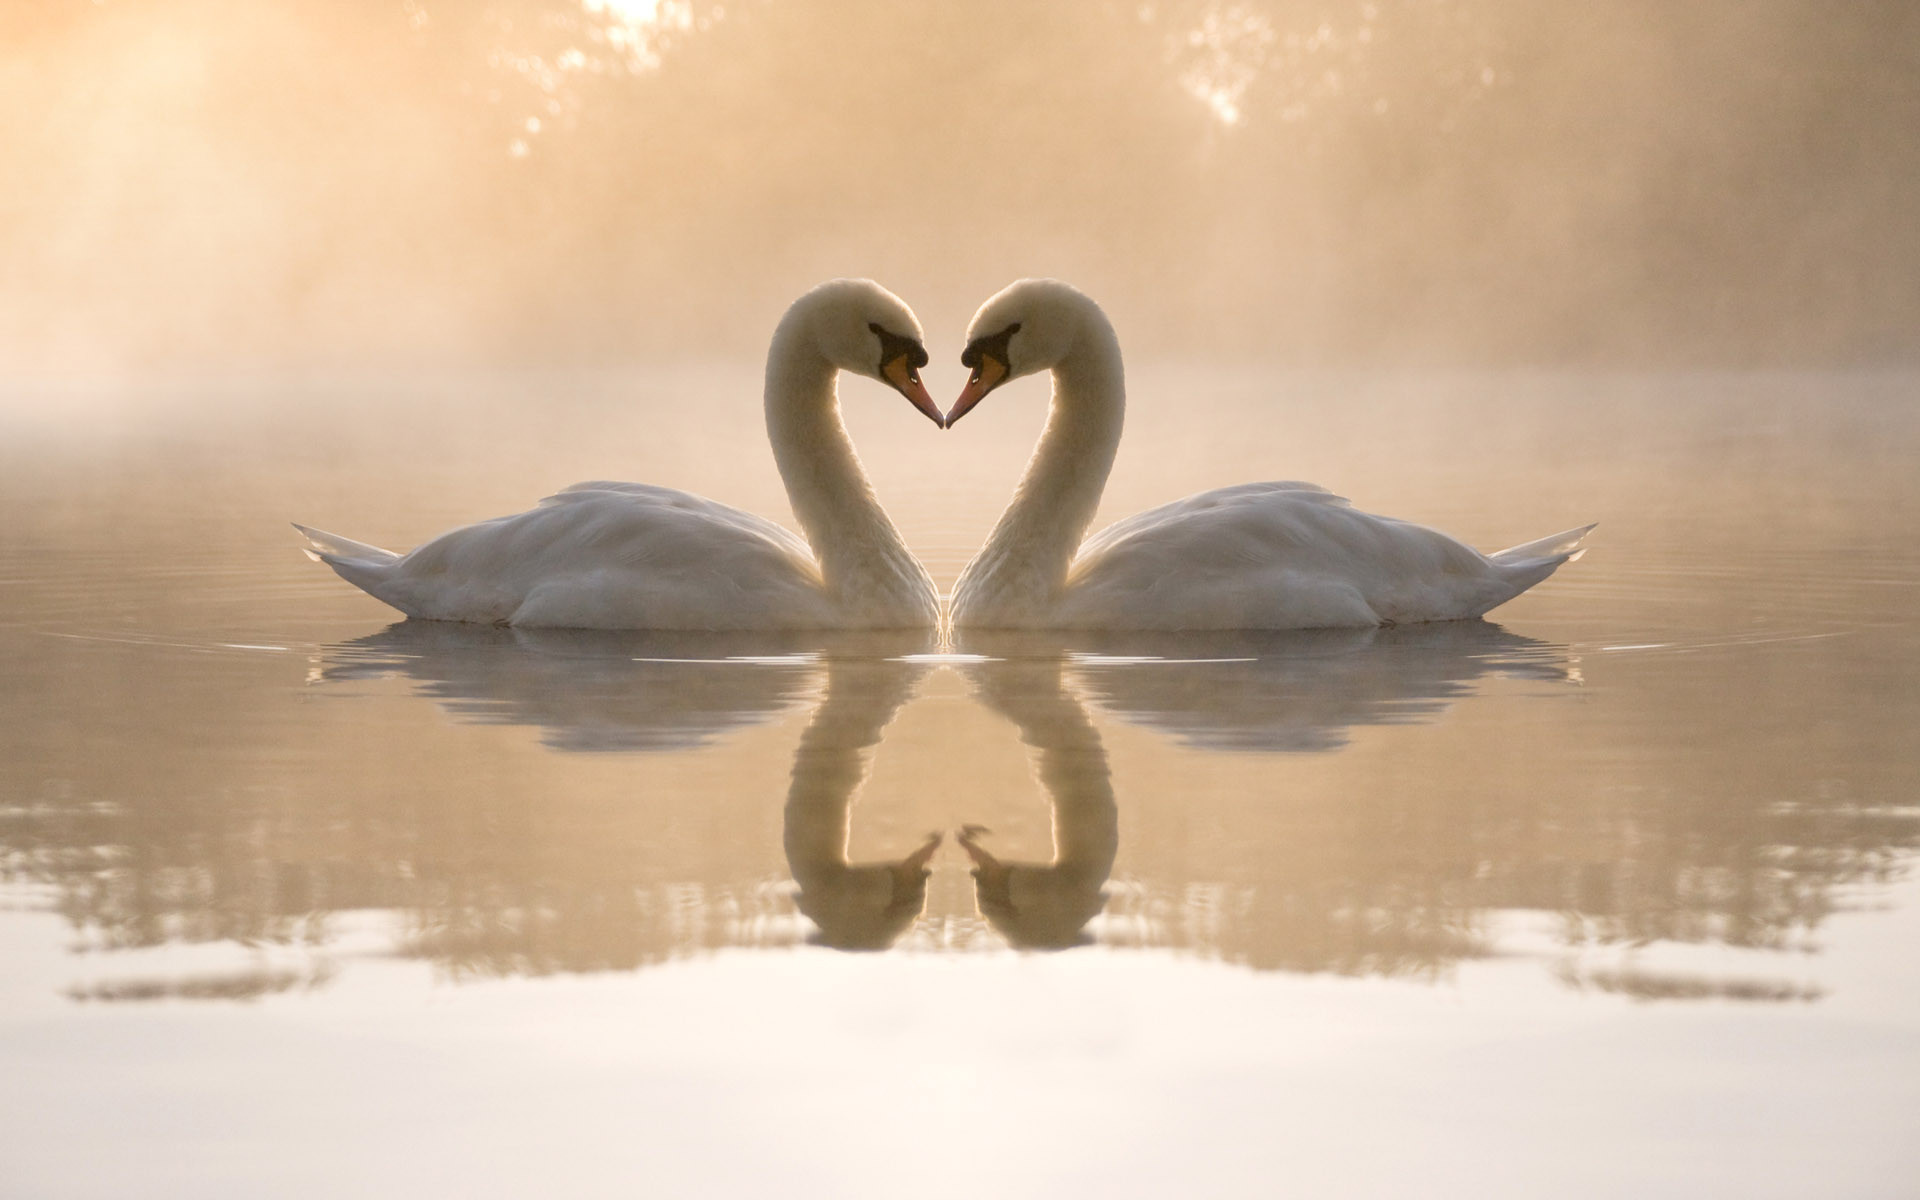 картинки пара лебедей